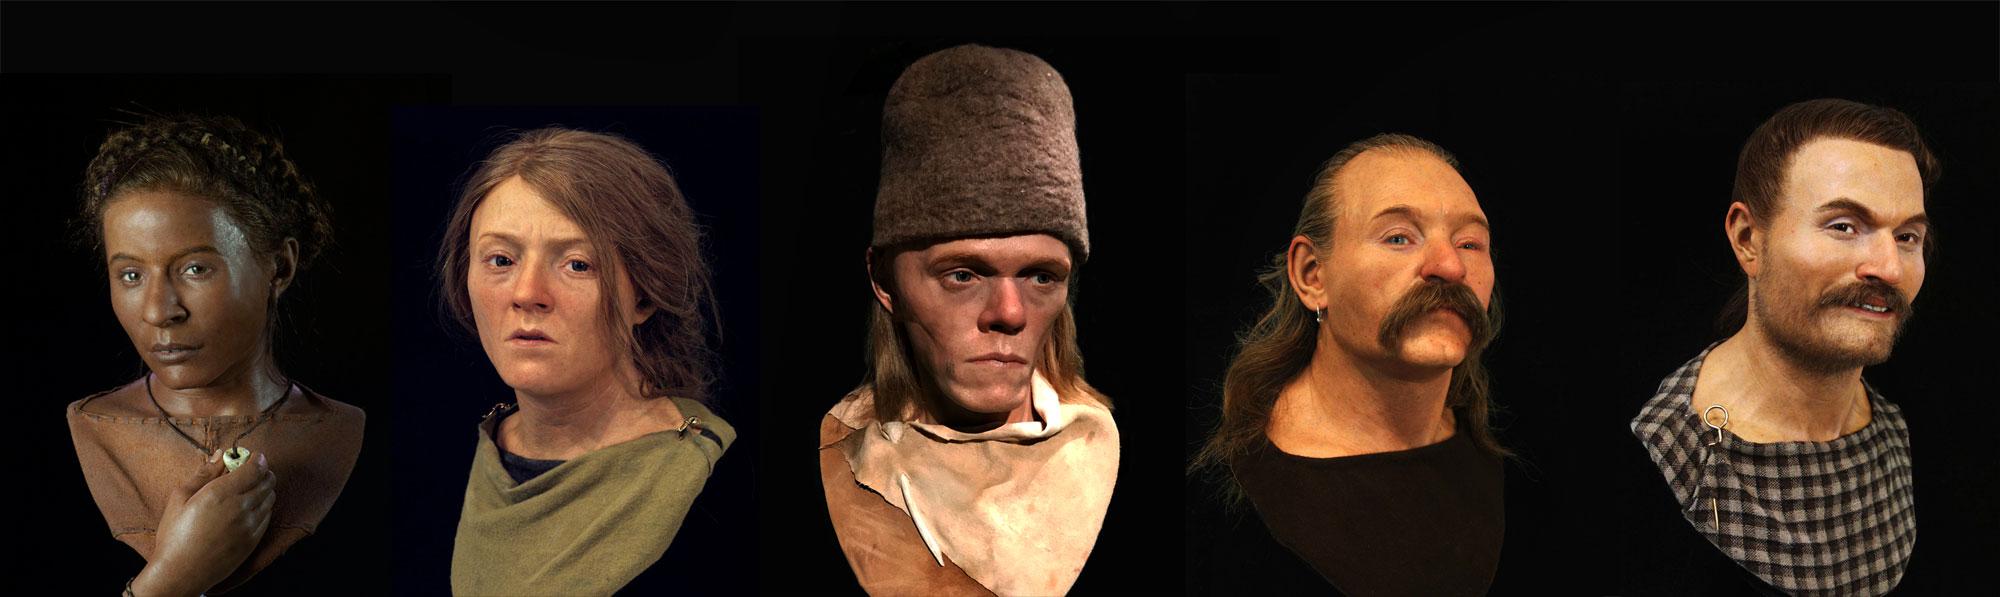 composite image showing five facial reconstruction models